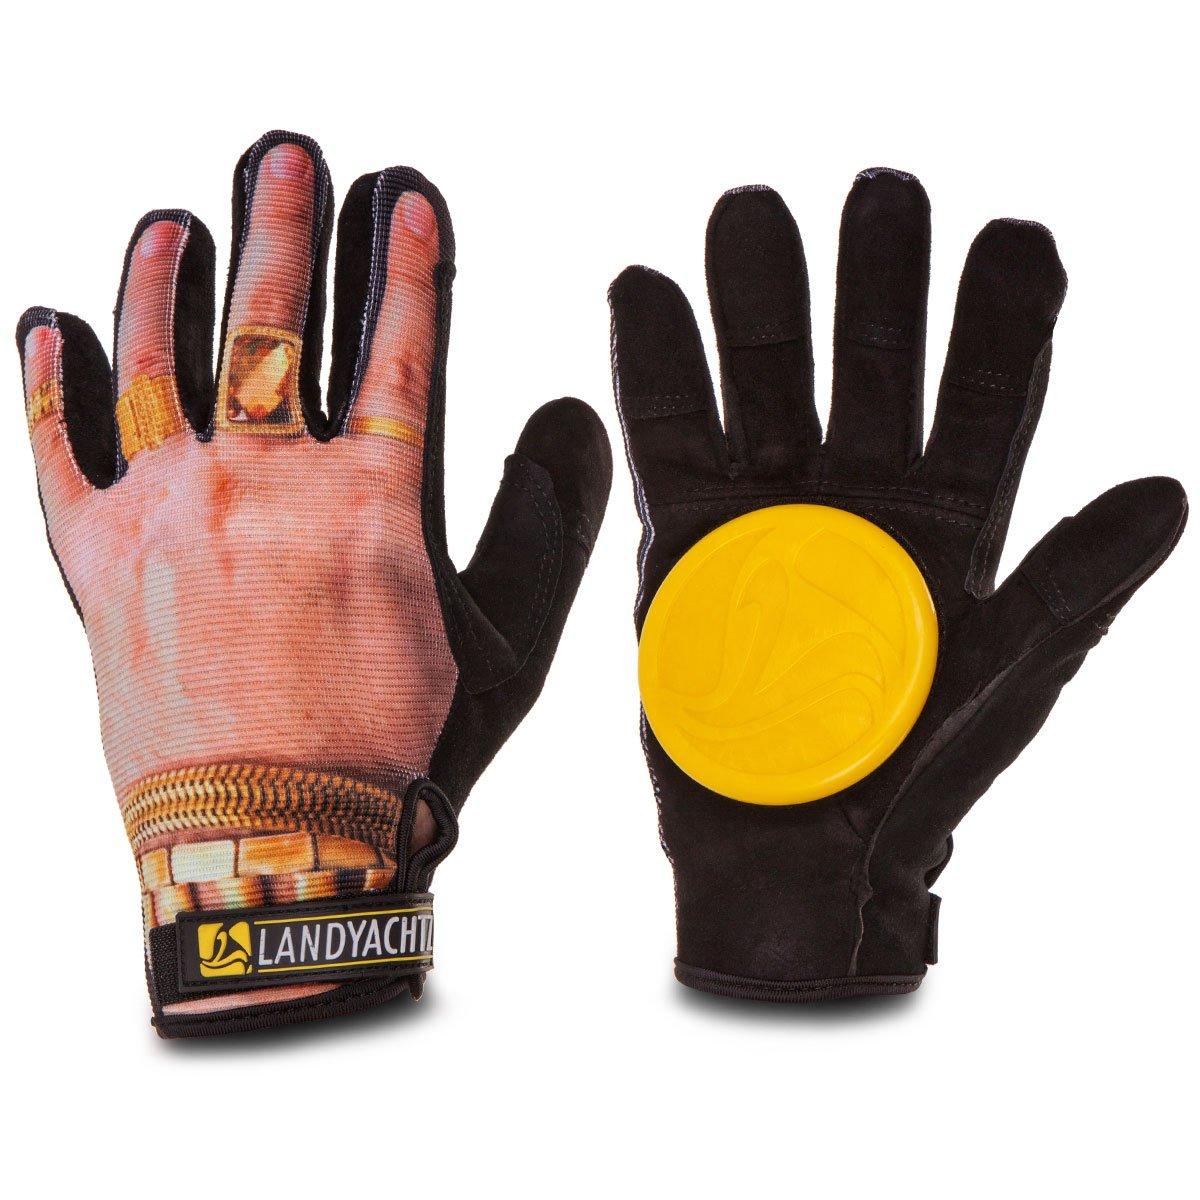 Landyachtz Bling Hands Slide Gloves - SM